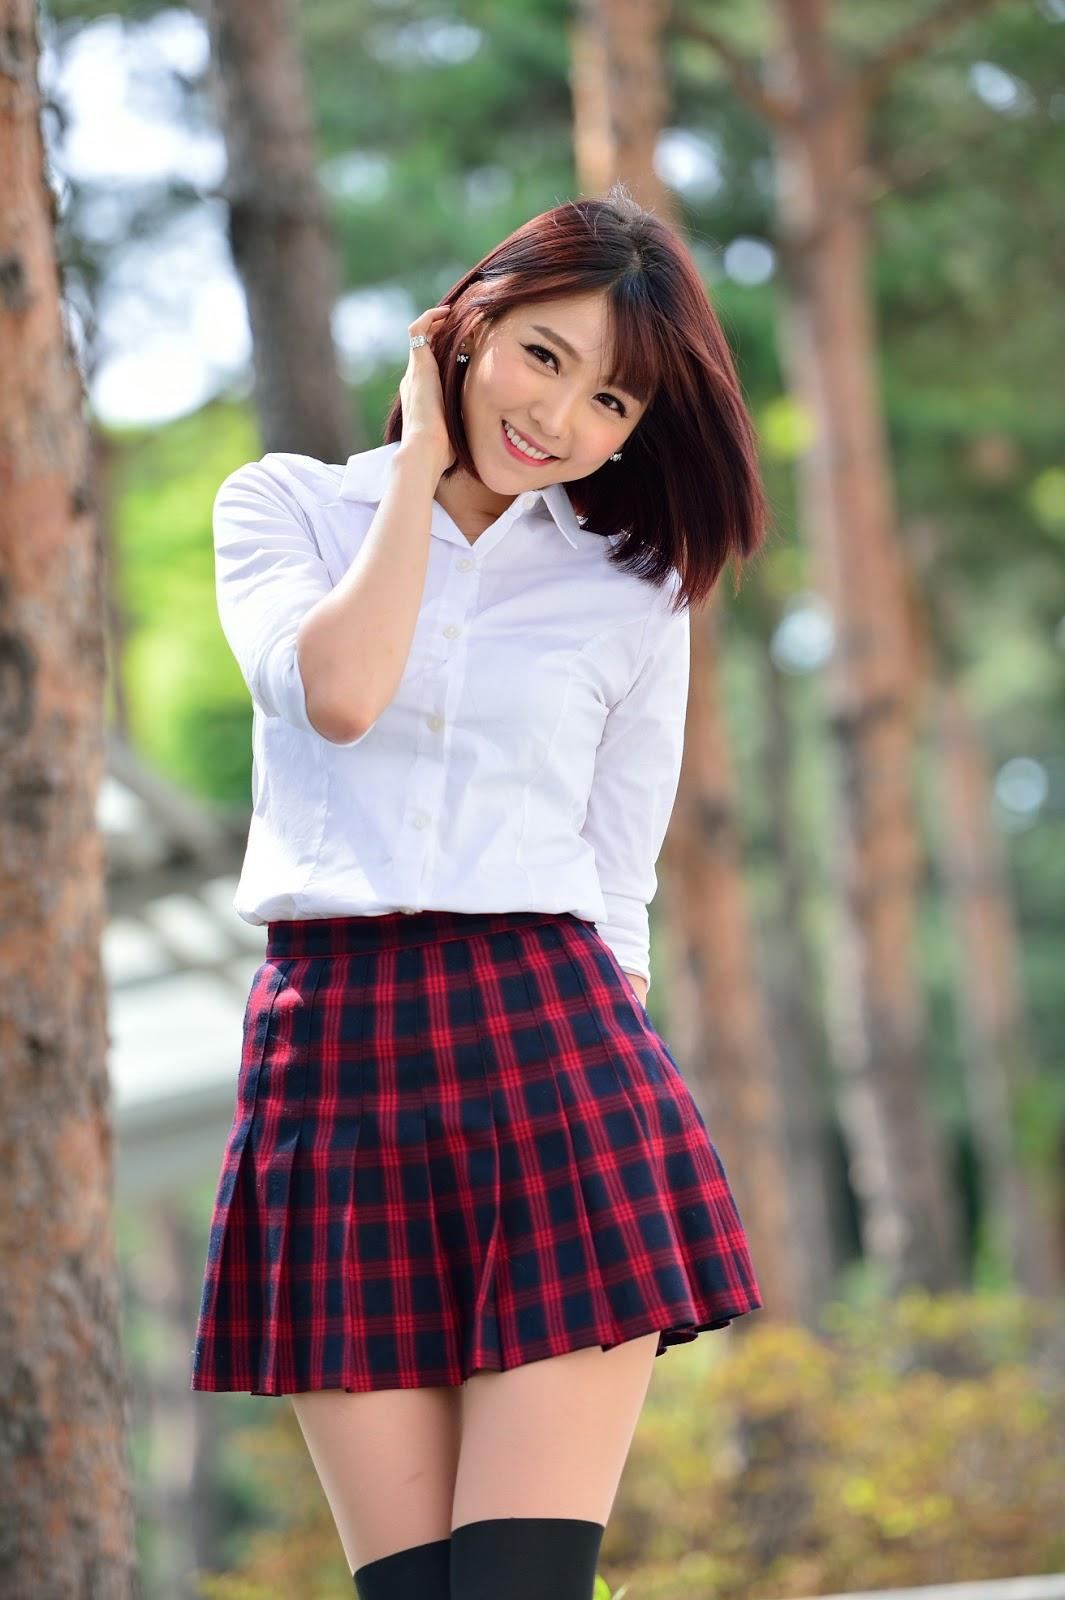 Full Hd School Girl